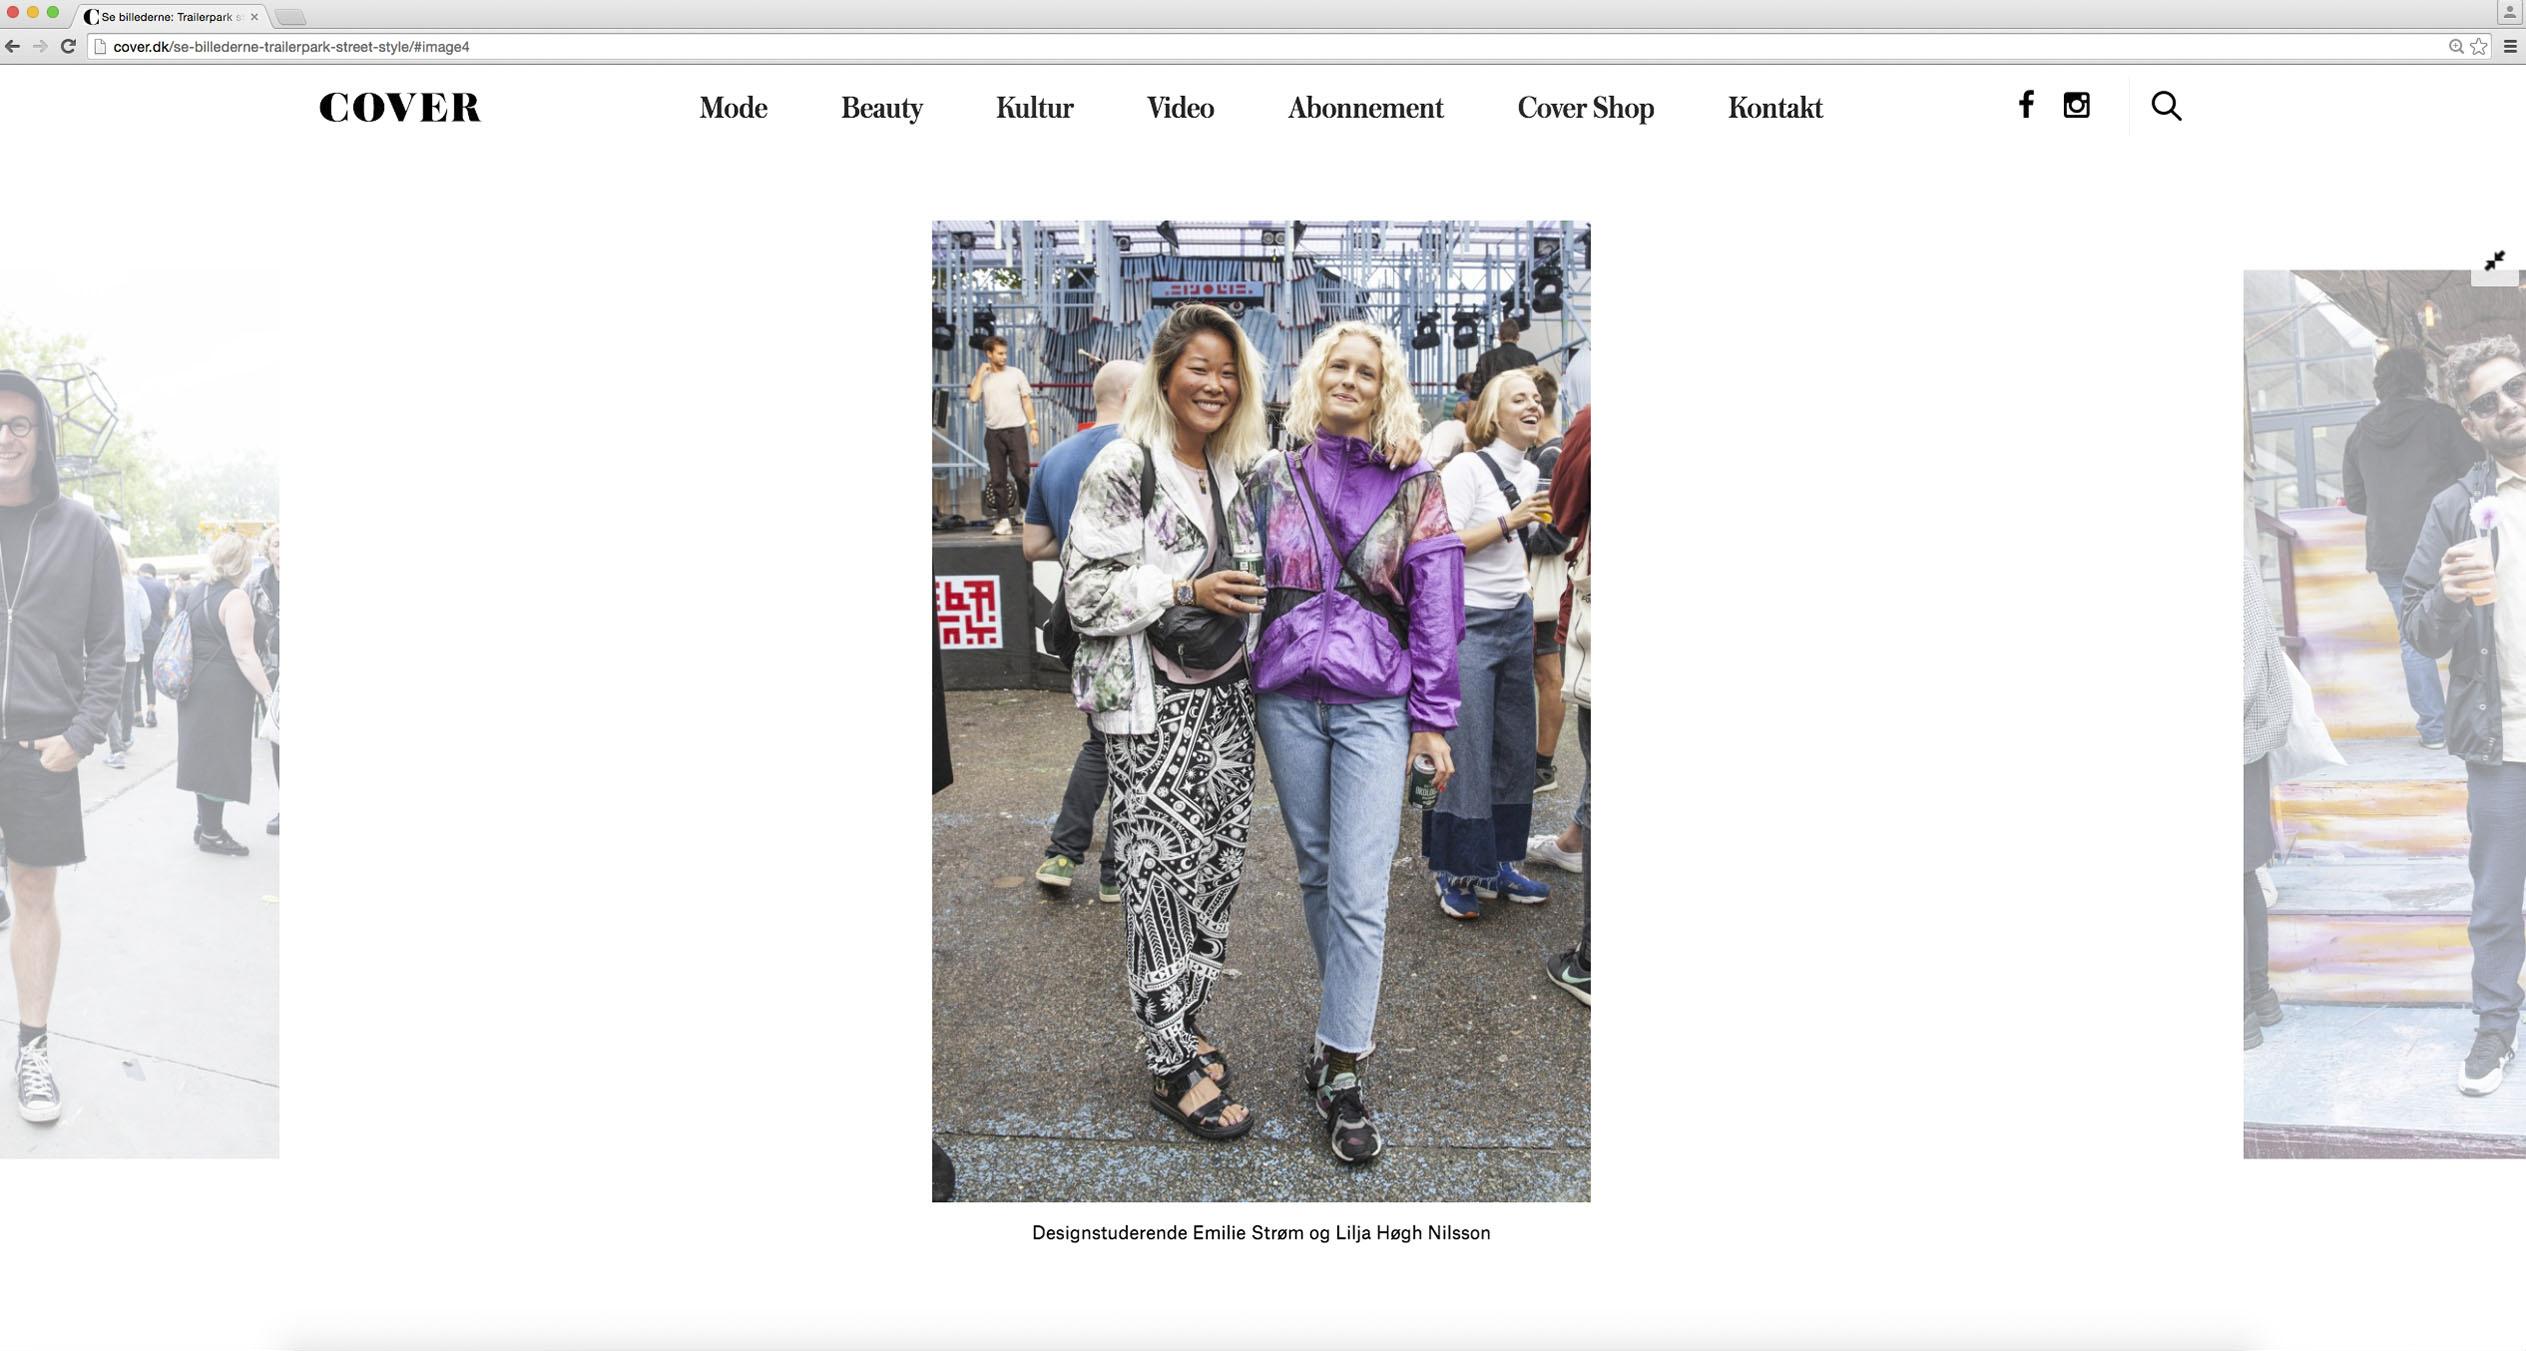 Streetstyle_CoverMagazine_TrailerparkFestival2016_4_2